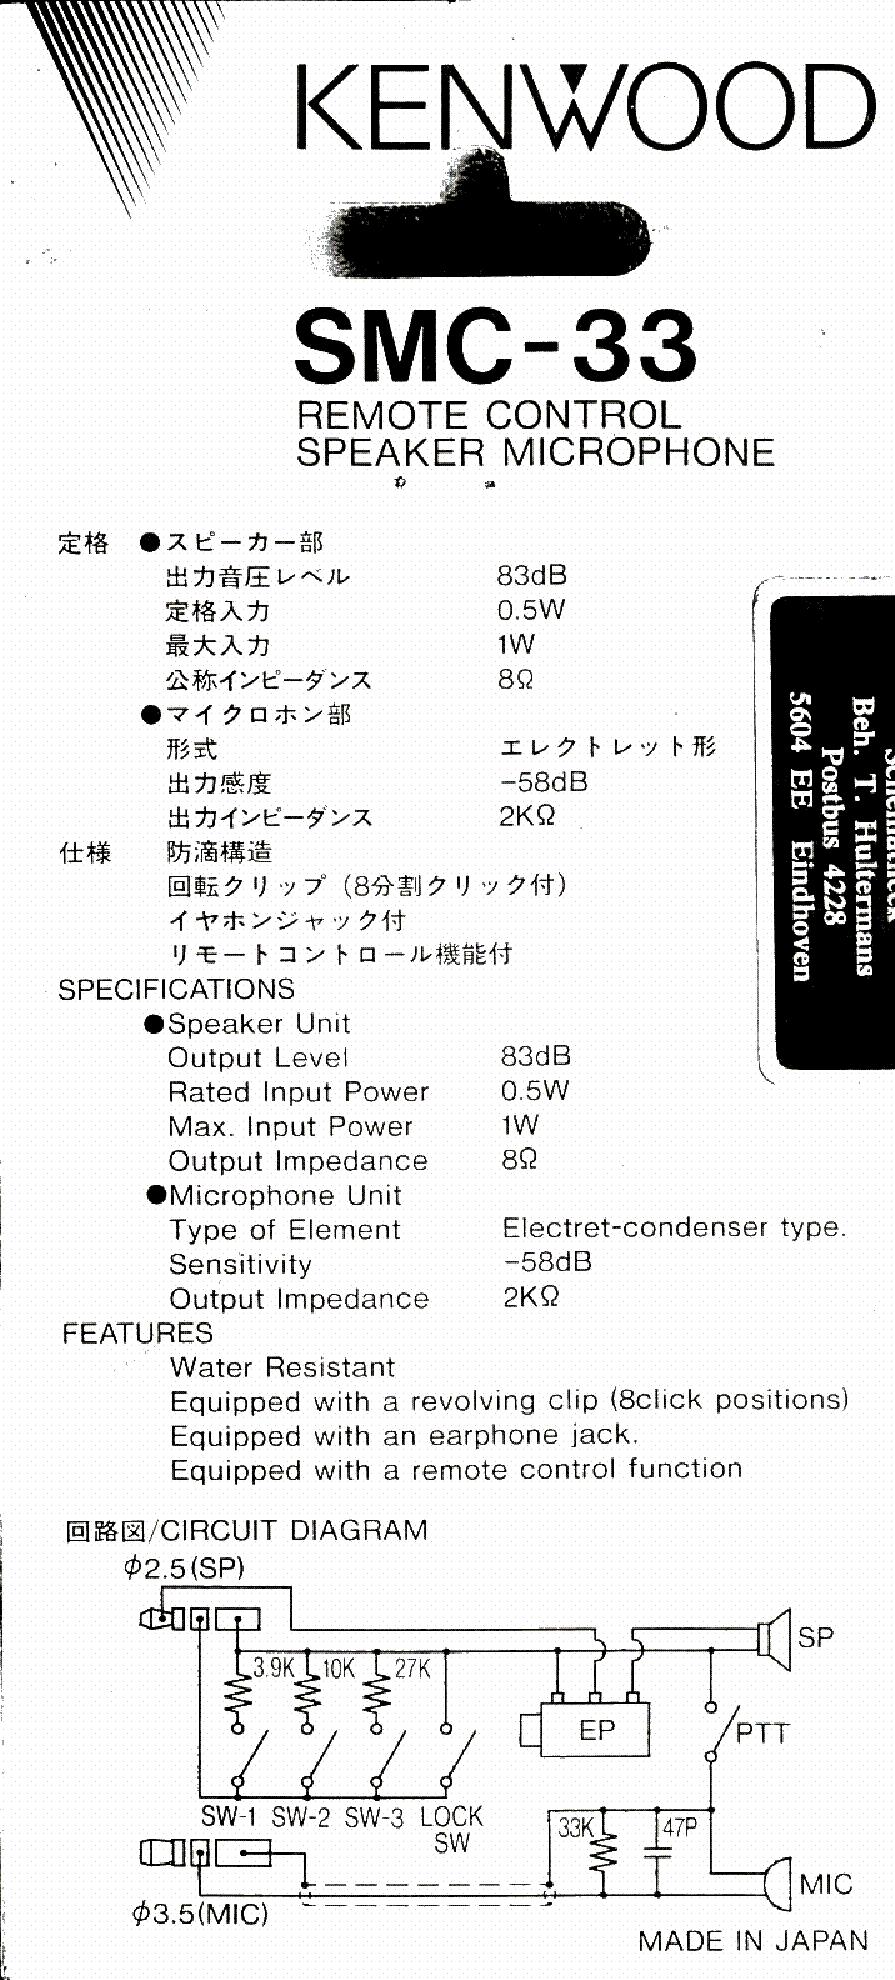 KENWOOD SMC-33 SCH Service Manual download, schematics, eeprom ...